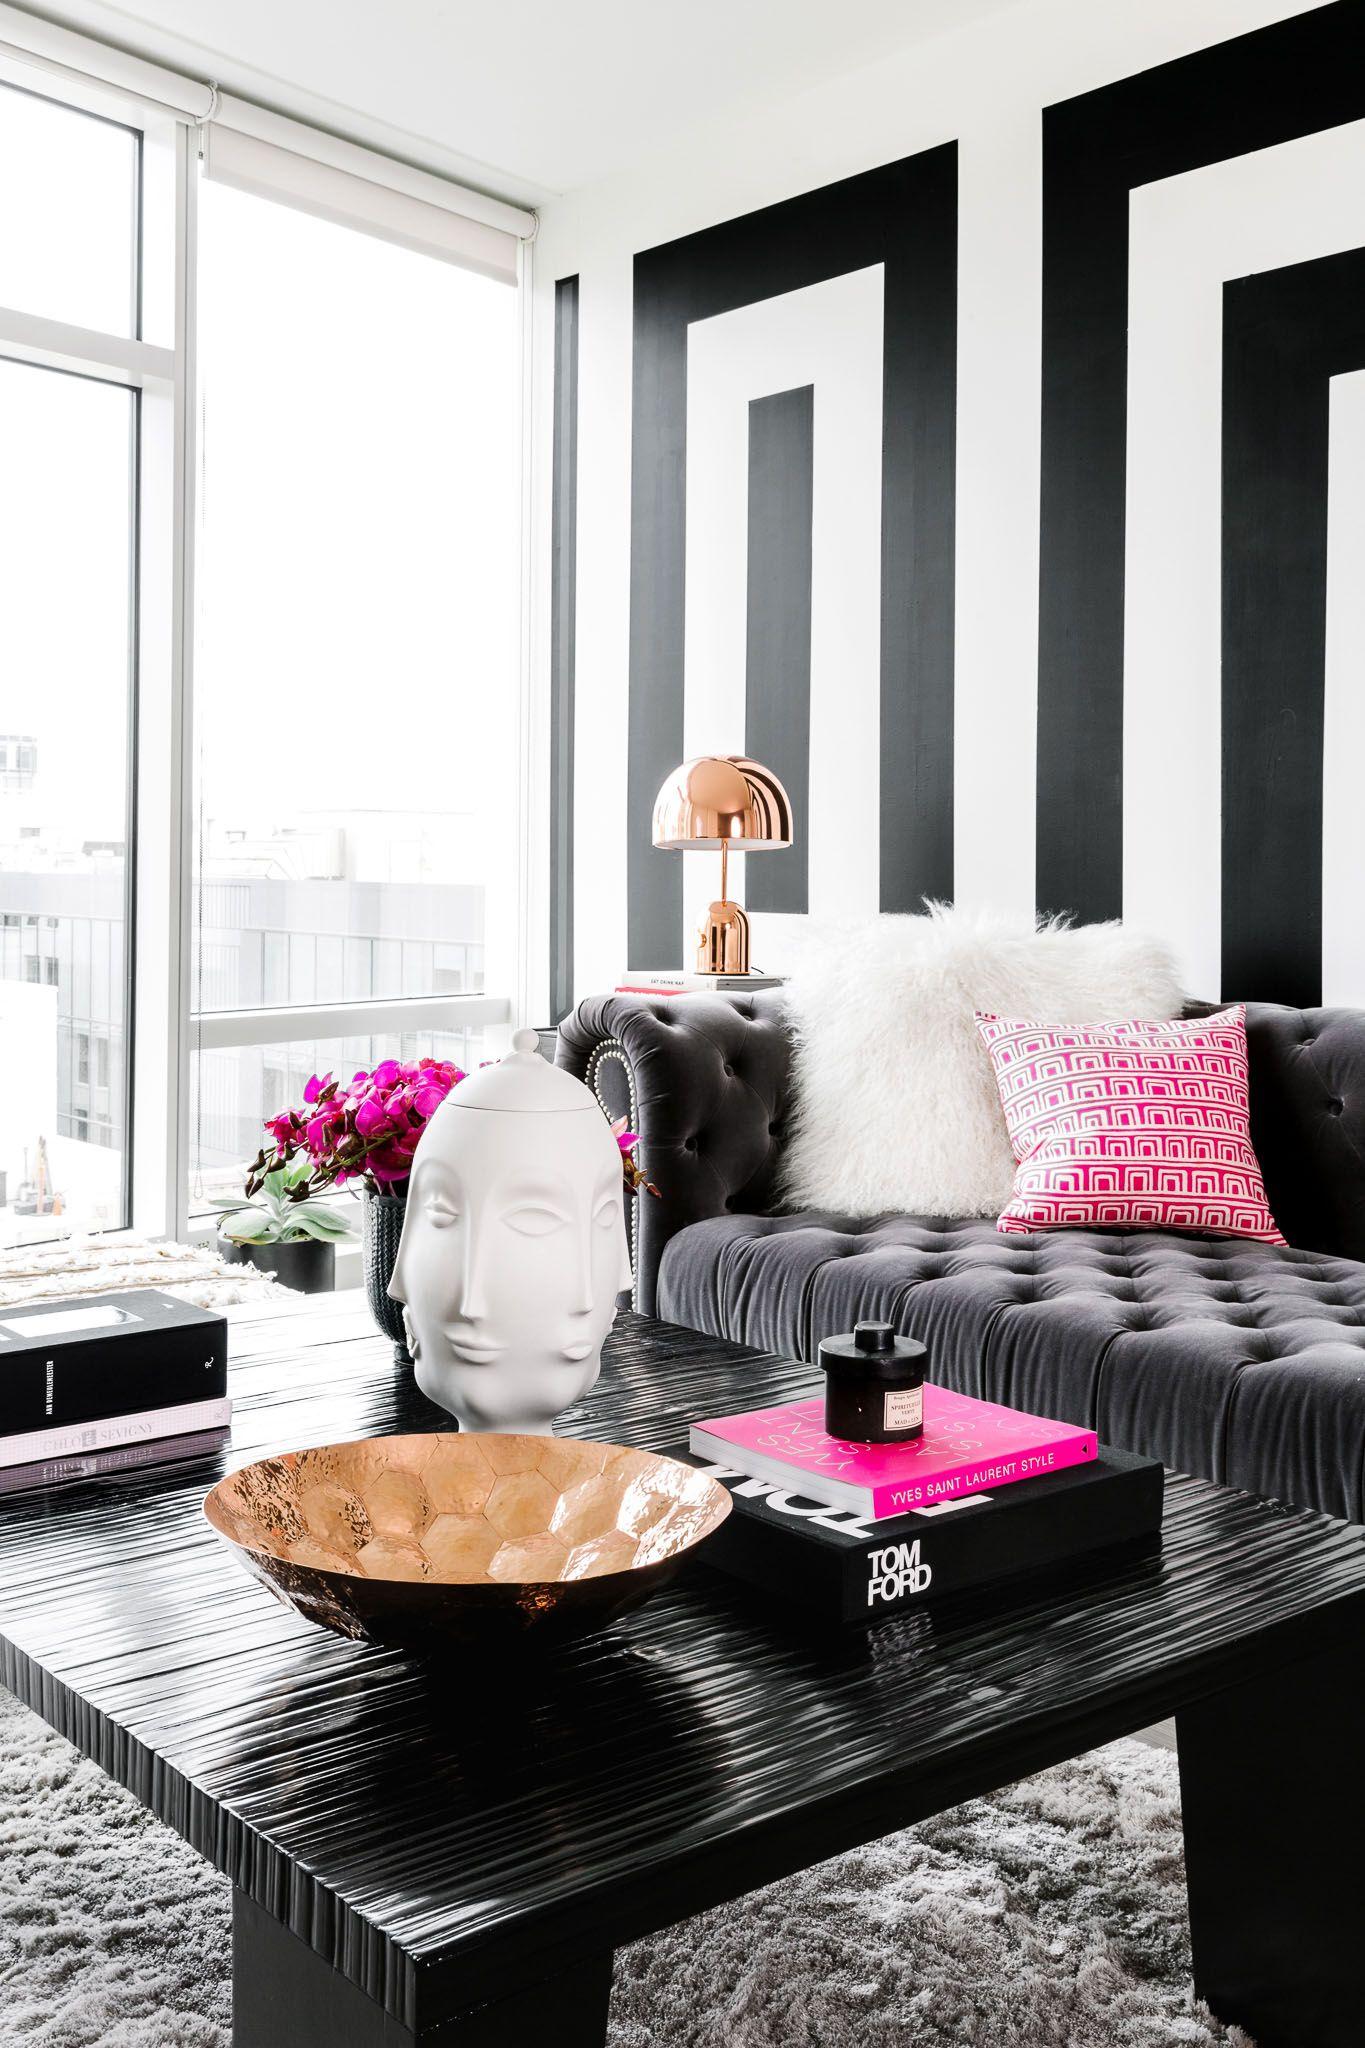 A San Francisco Apartment All in Black & White